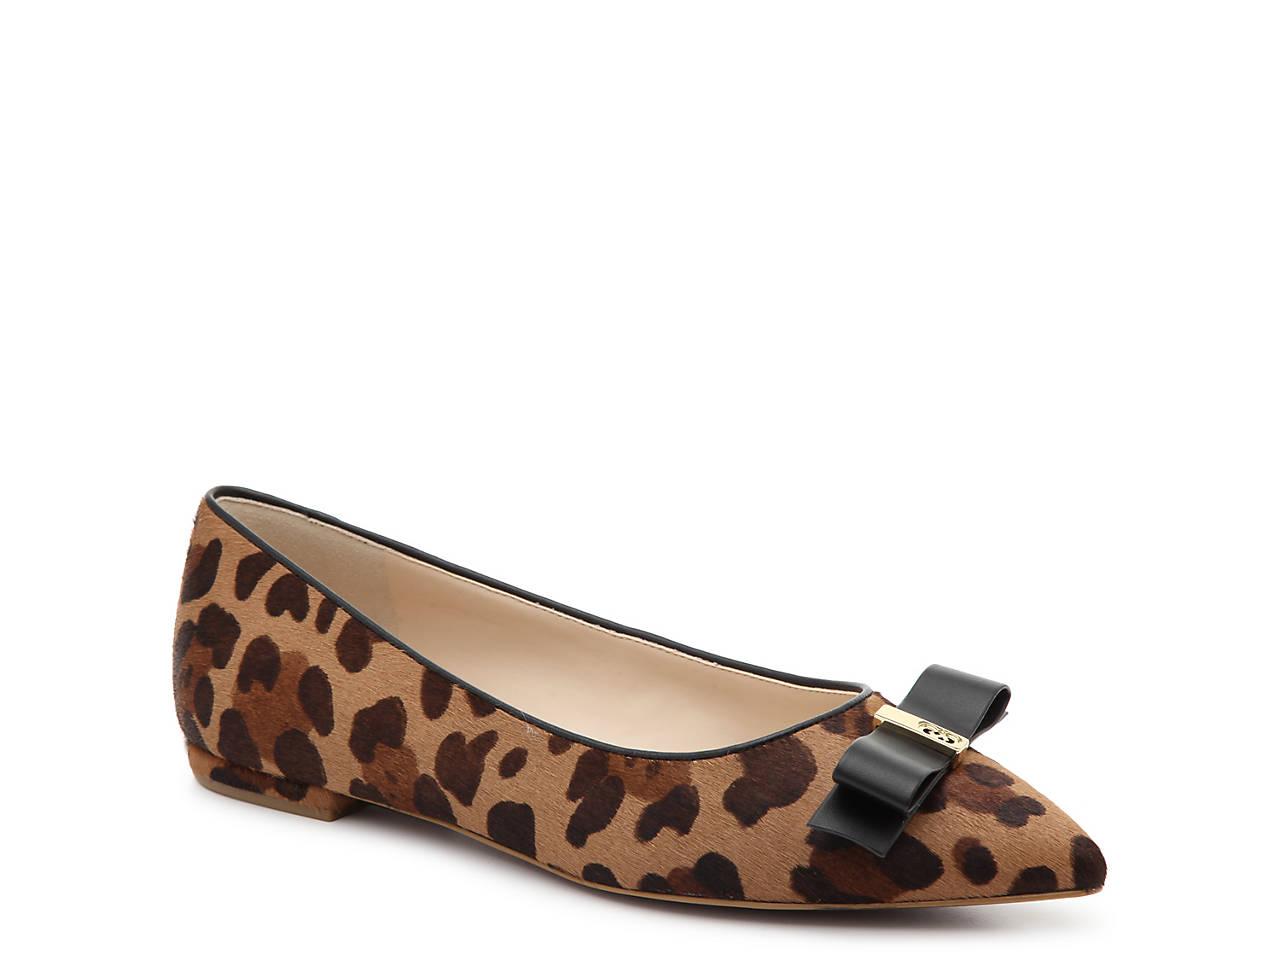 3eb9f1701 Cole Haan Elsie Flat Women's Shoes | DSW